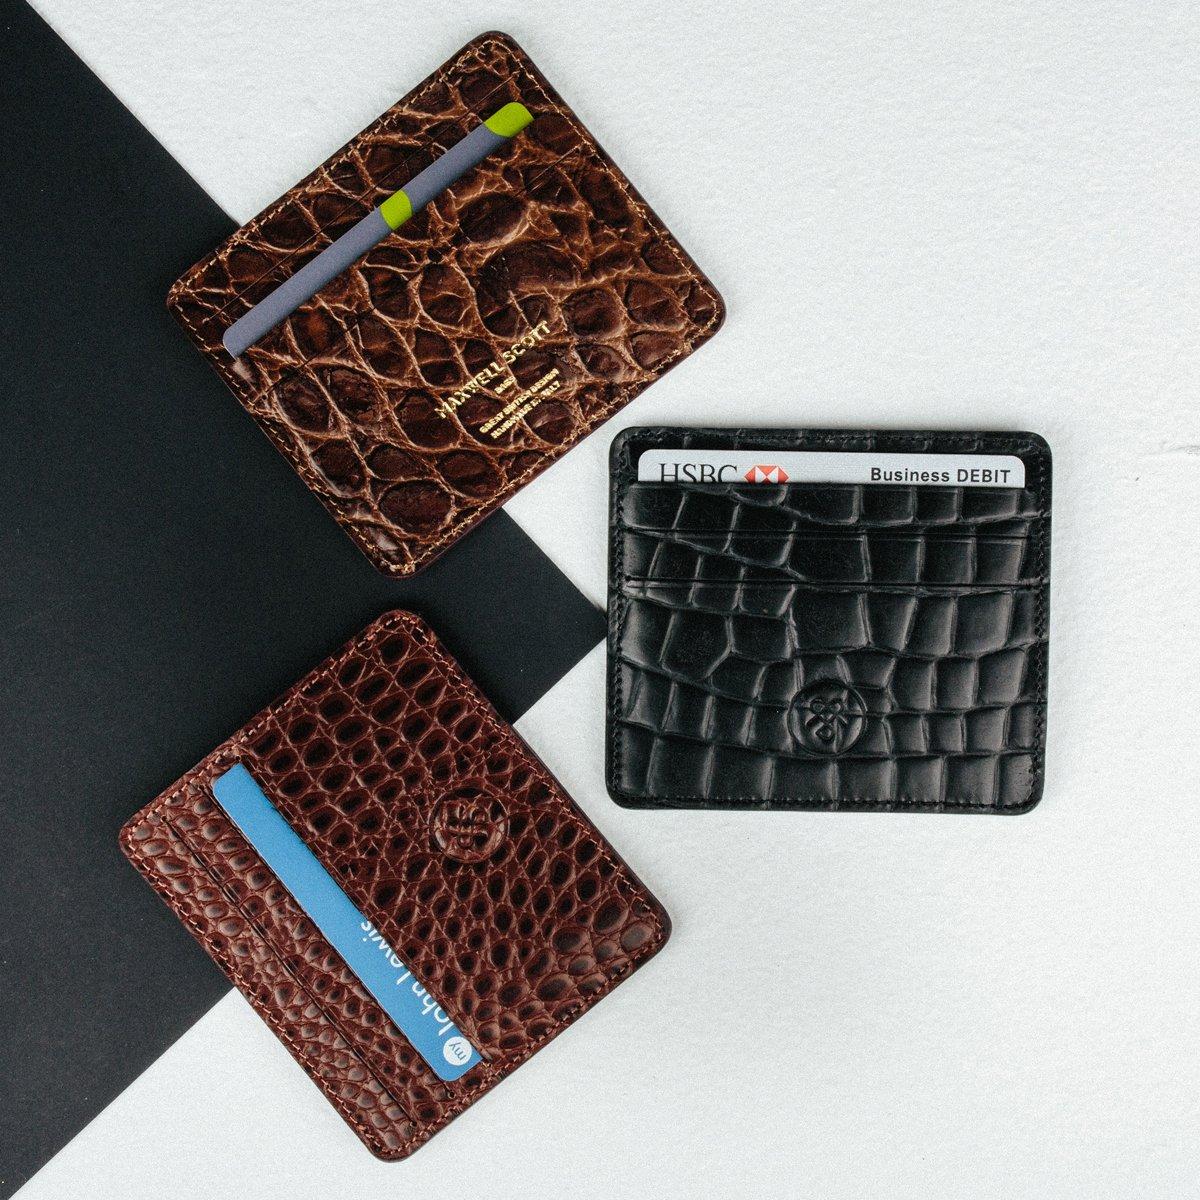 Maxwell Scott Luxury Italian Leather Mens Faux Crocodile Card Holder - Choc